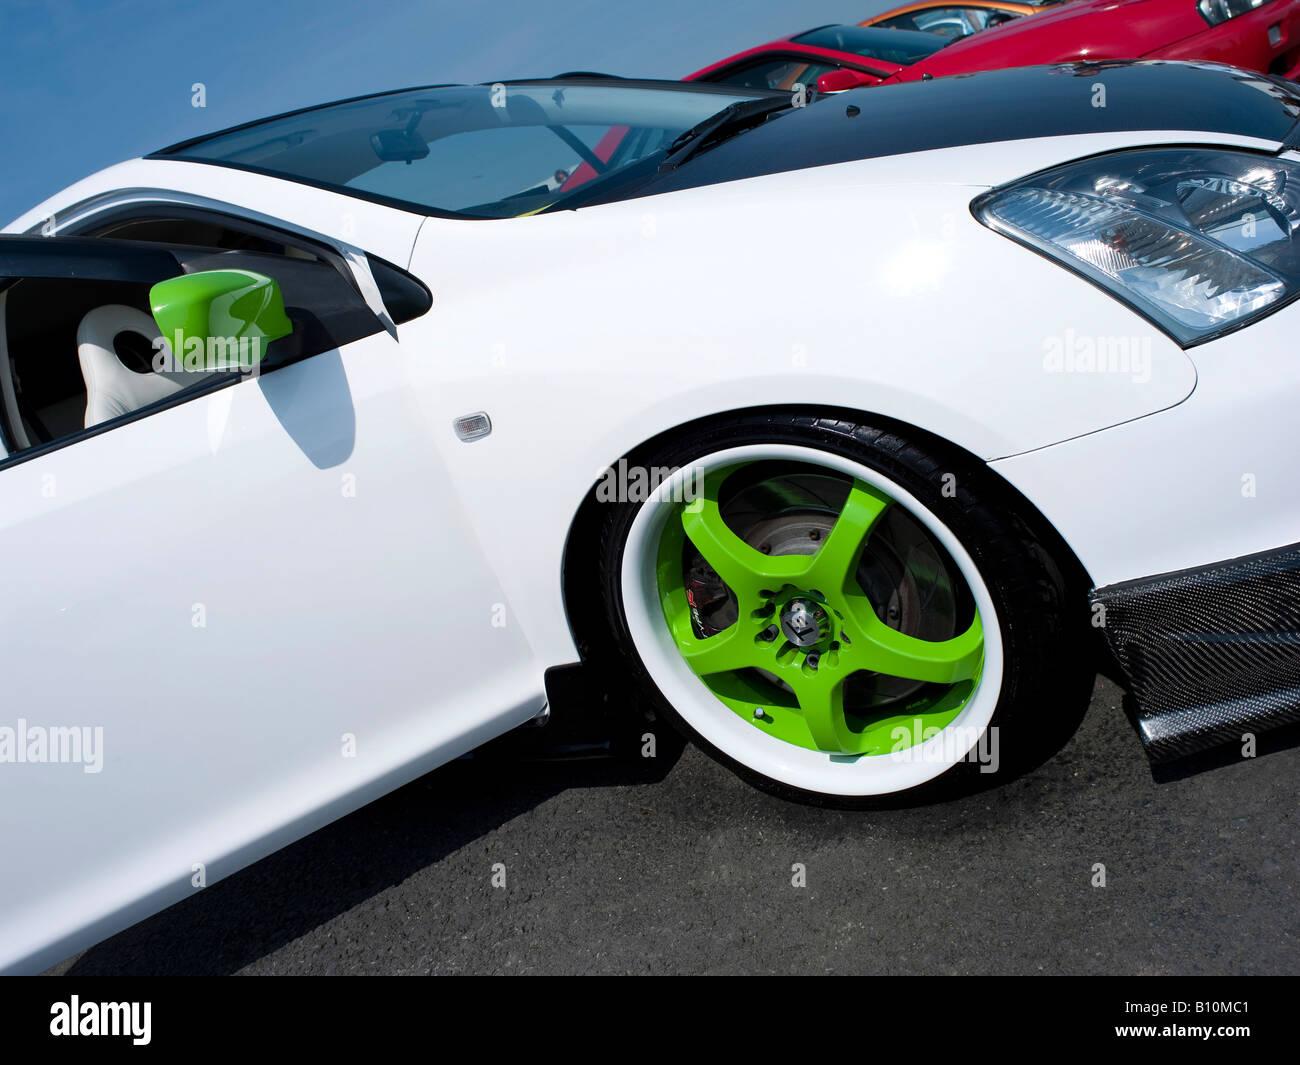 White Honda Civic Type R Green Wheel Rims Slammed Rim Cars Santa Pod Car Auto Automobile Show Hood Bonnet Blue Colour Colo